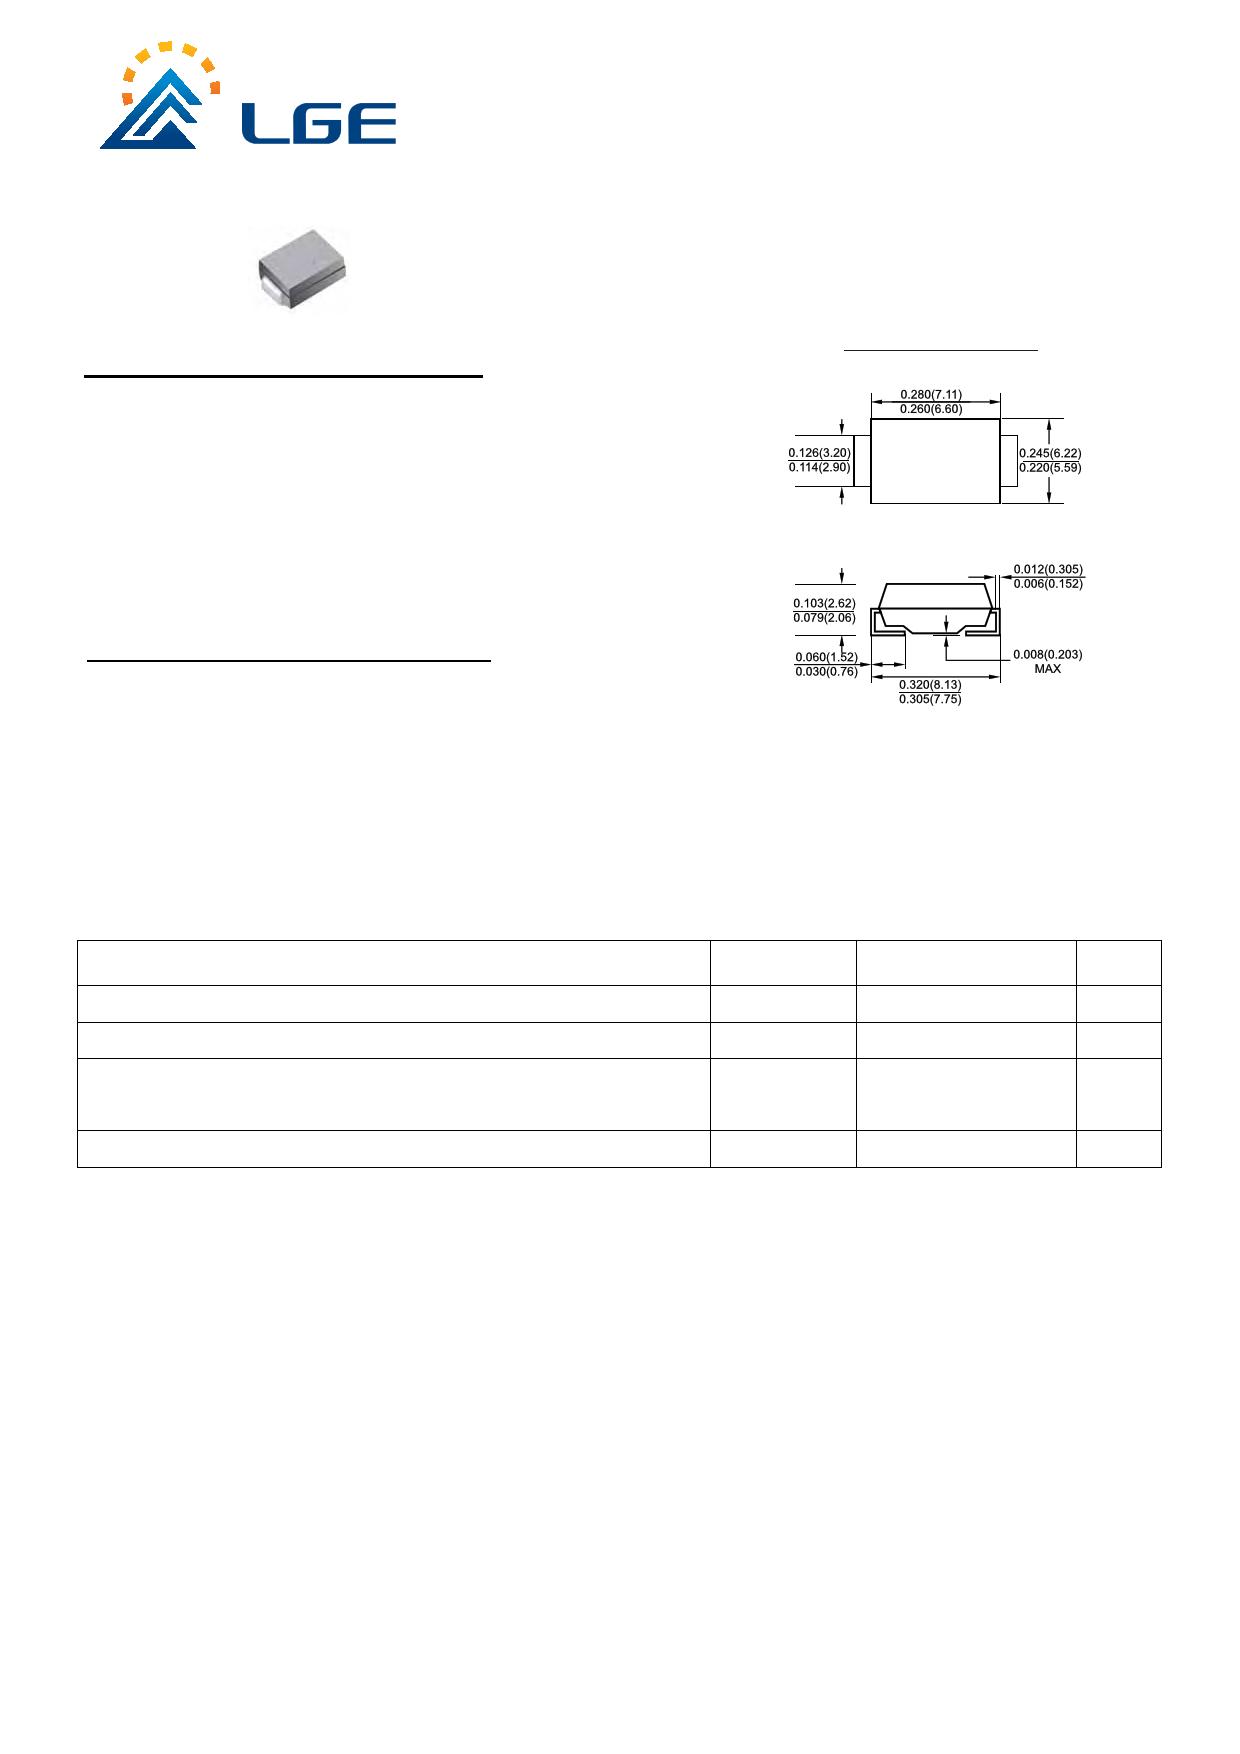 3.0SMCJ210CA Datasheet, 3.0SMCJ210CA PDF,ピン配置, 機能